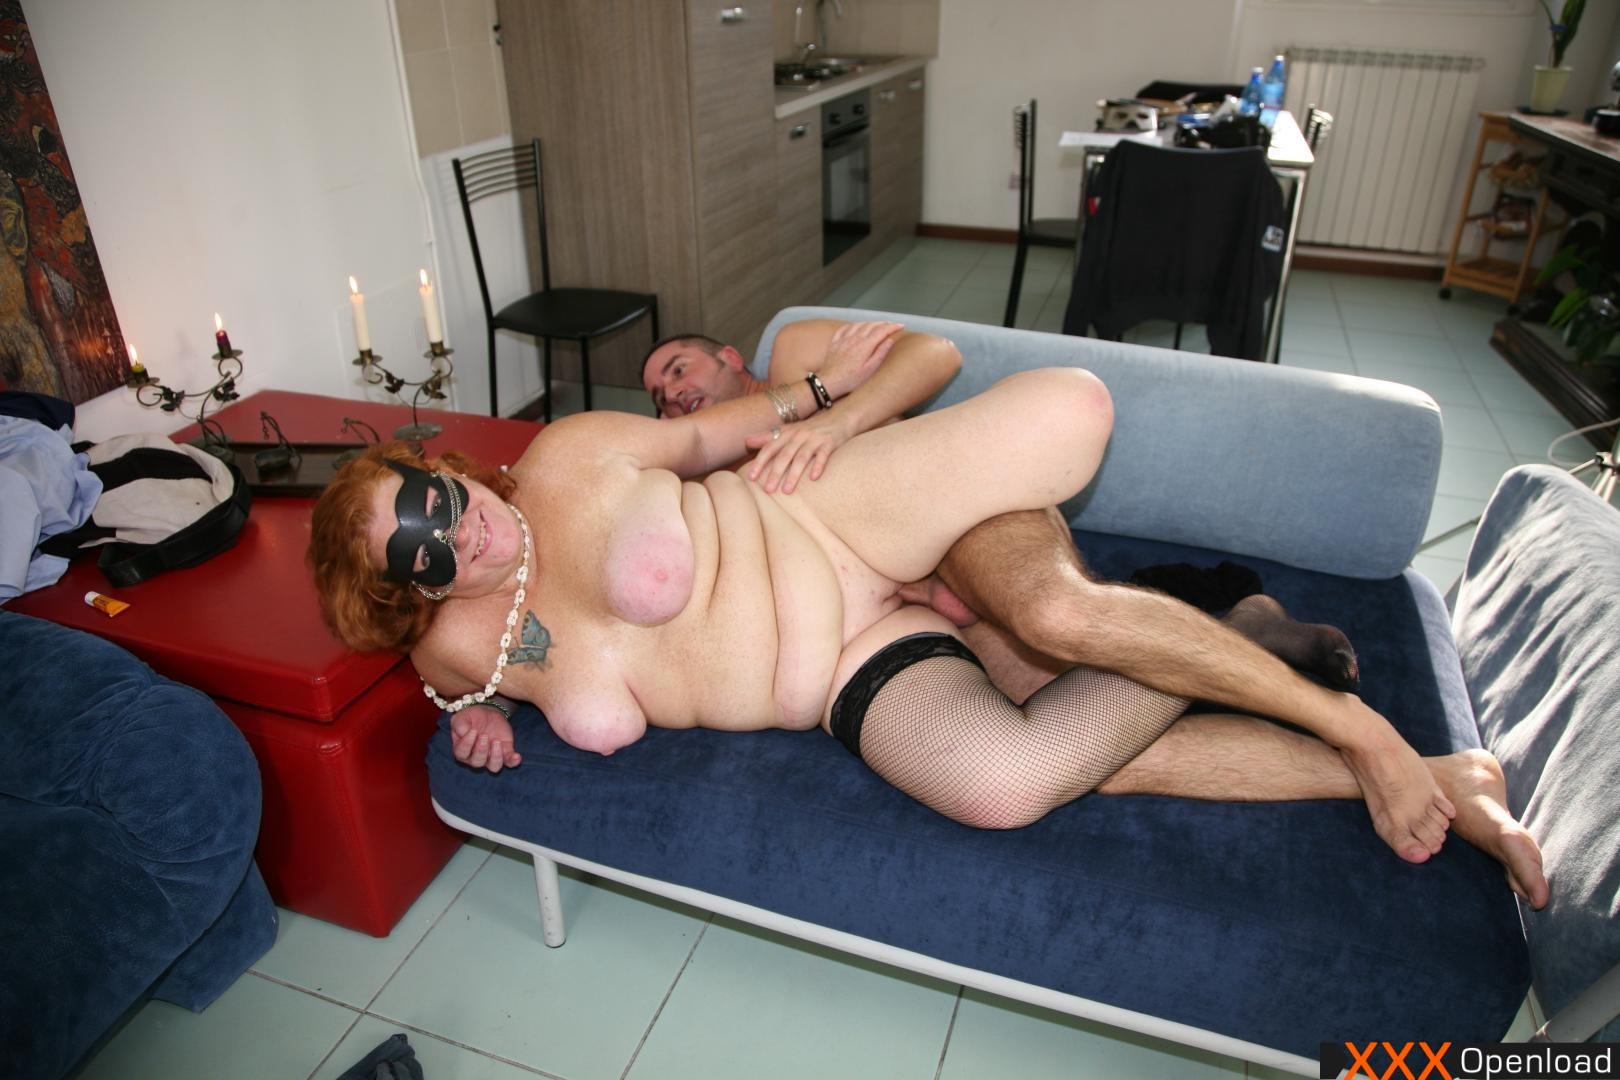 useful brazilian girl nude selfie join. All